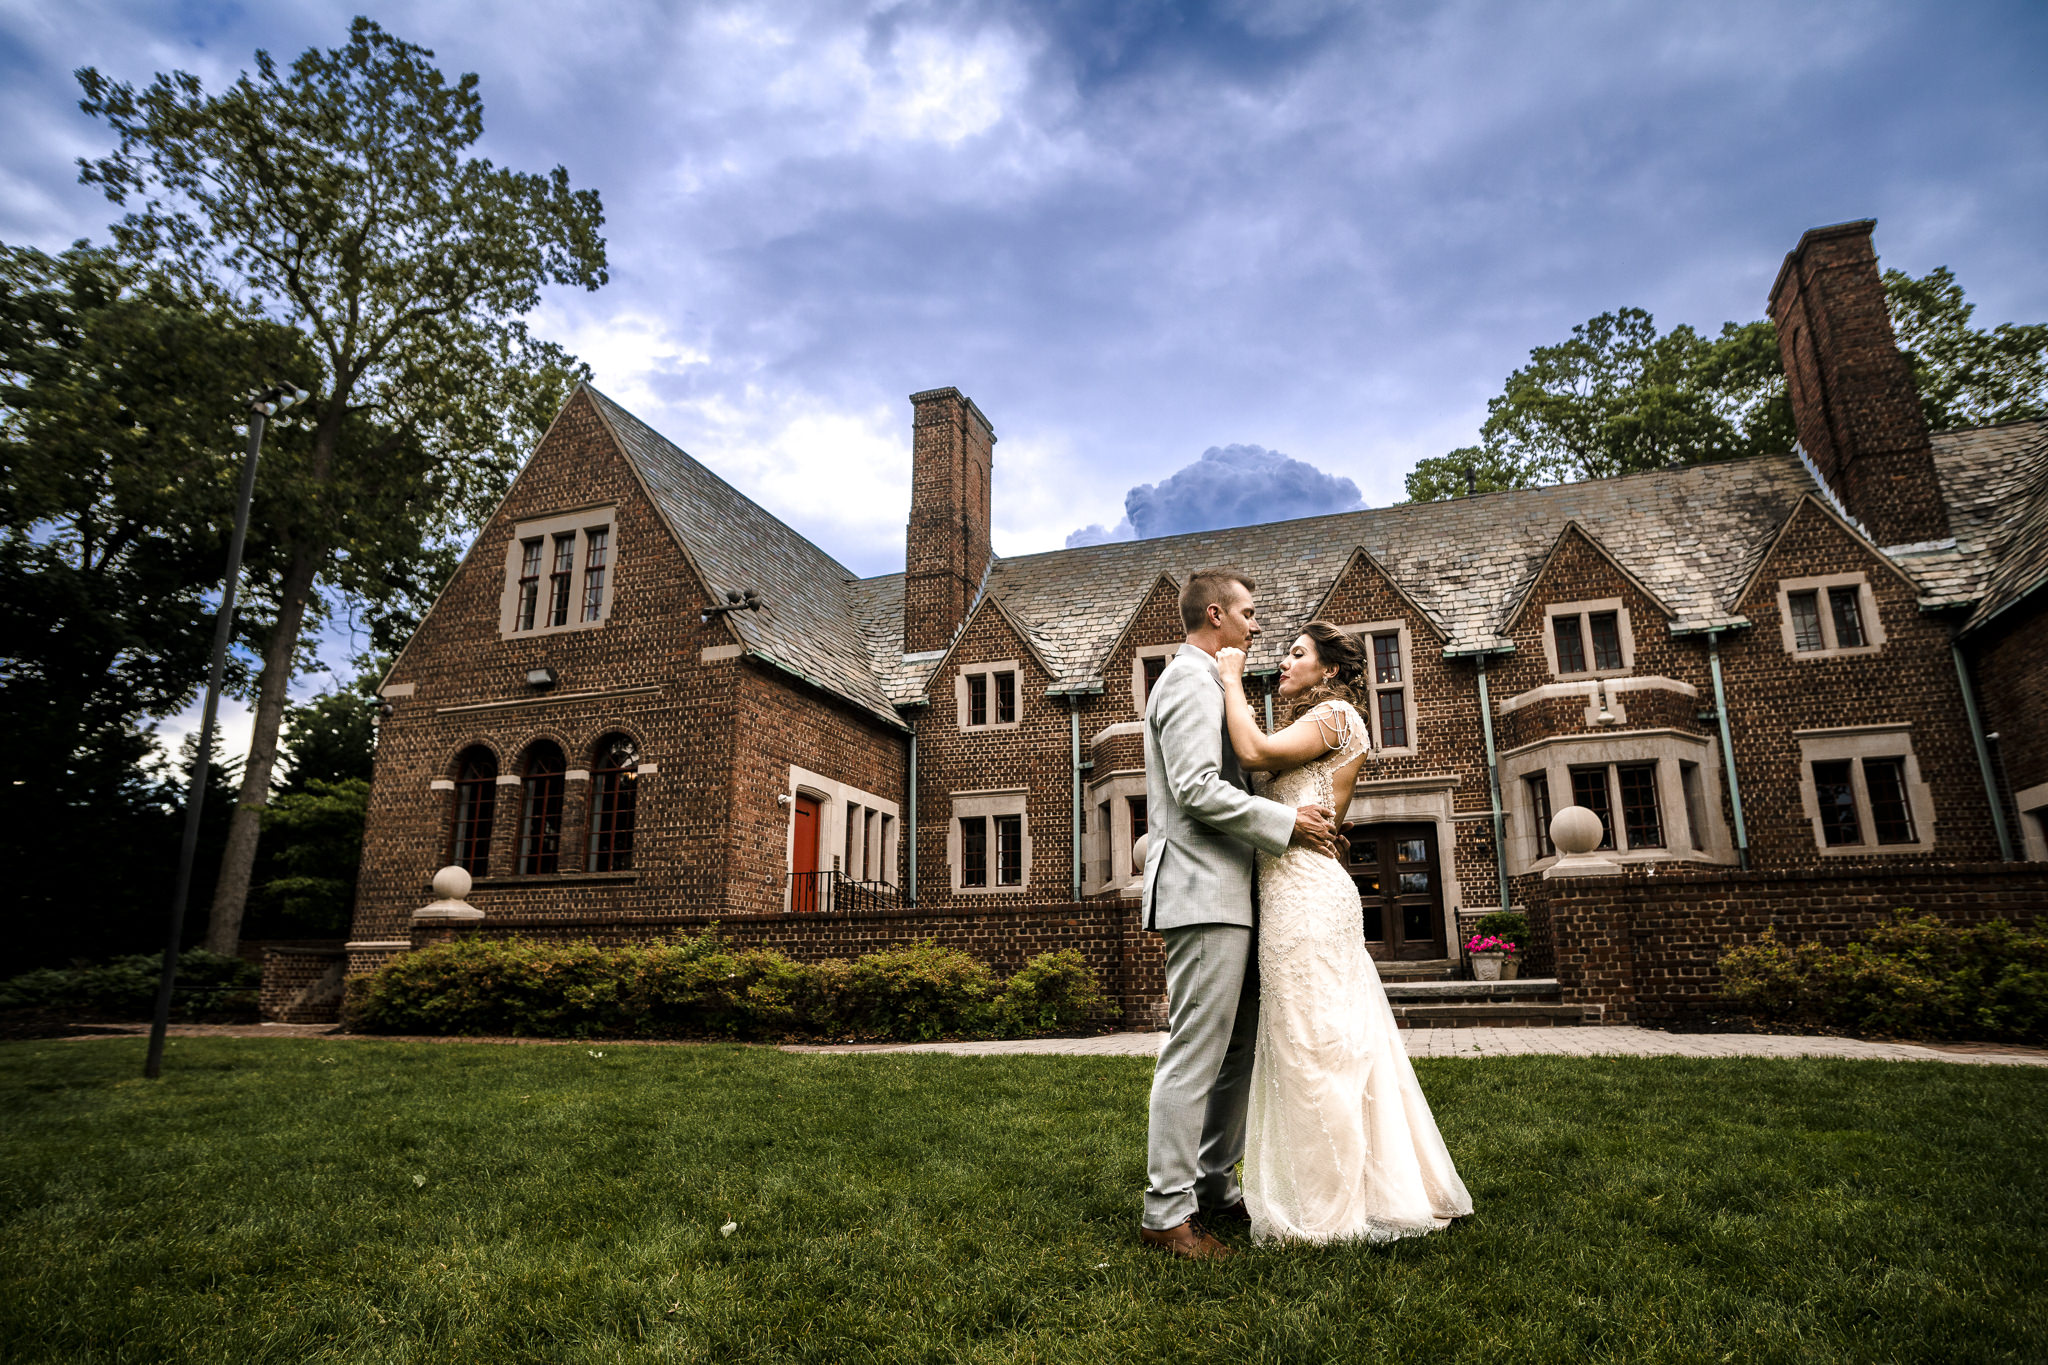 Barbato-Moorestown-Community-House-Wedding-New-Jersey-Photographer-26.JPG